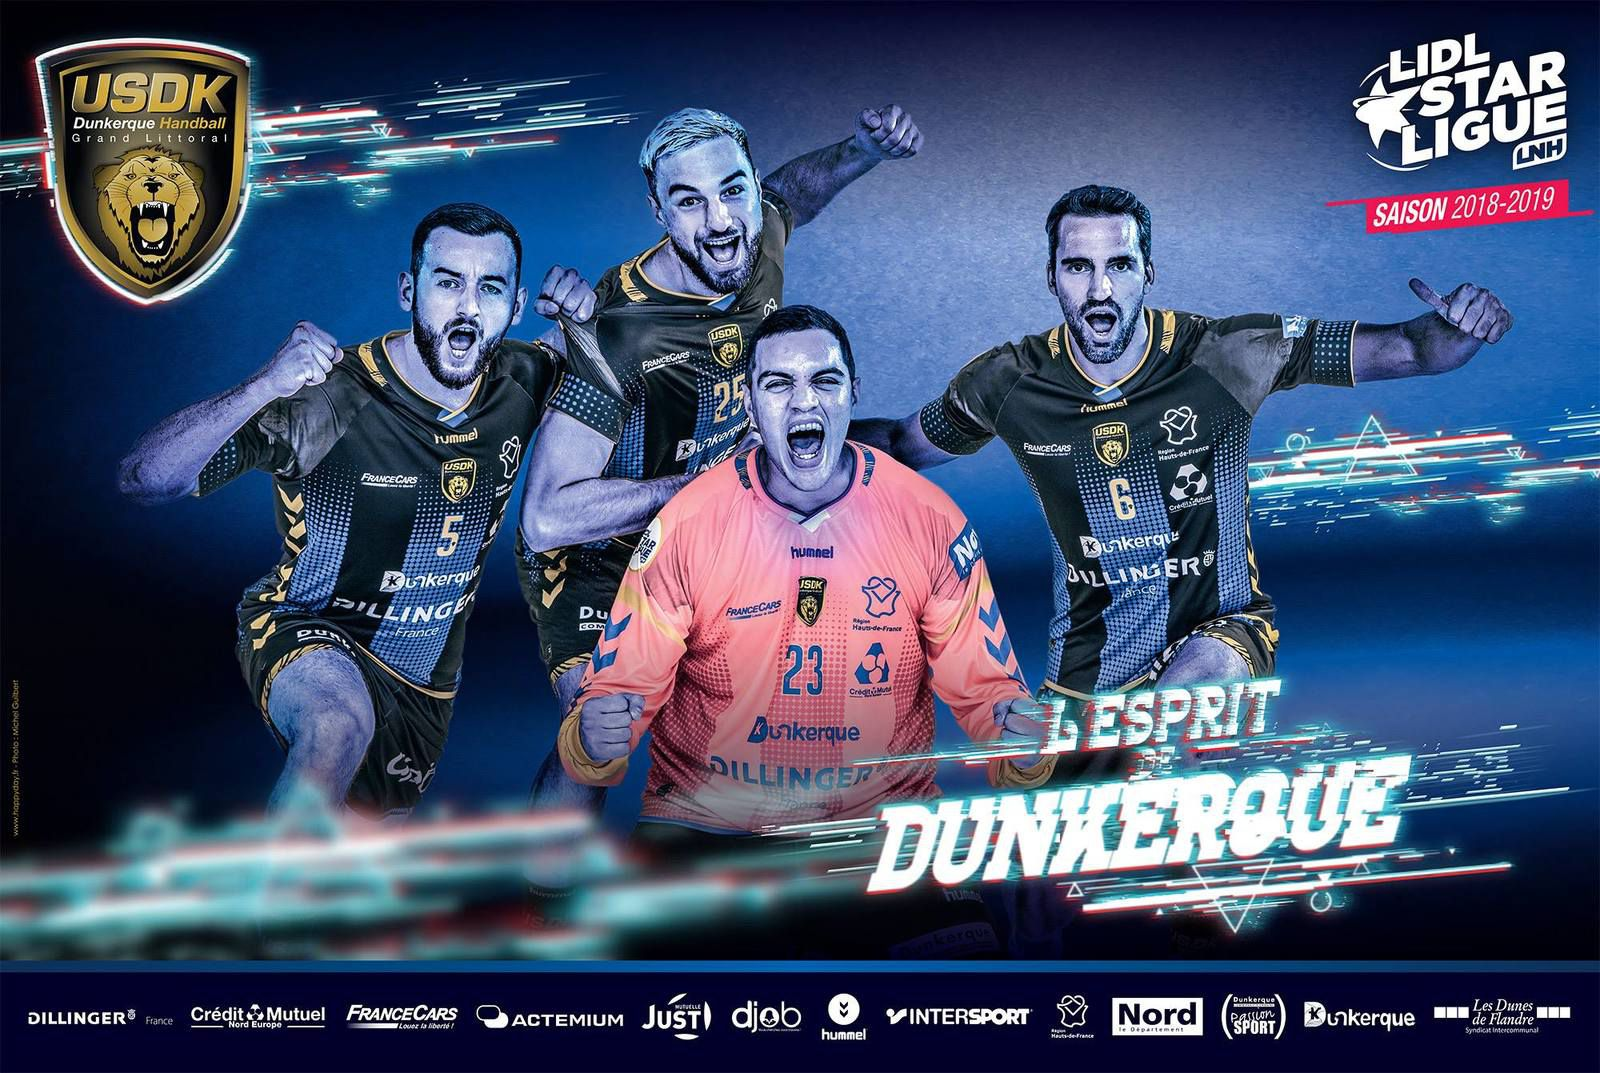 Tenue domicile et gardien USDK Handball 2018 2019